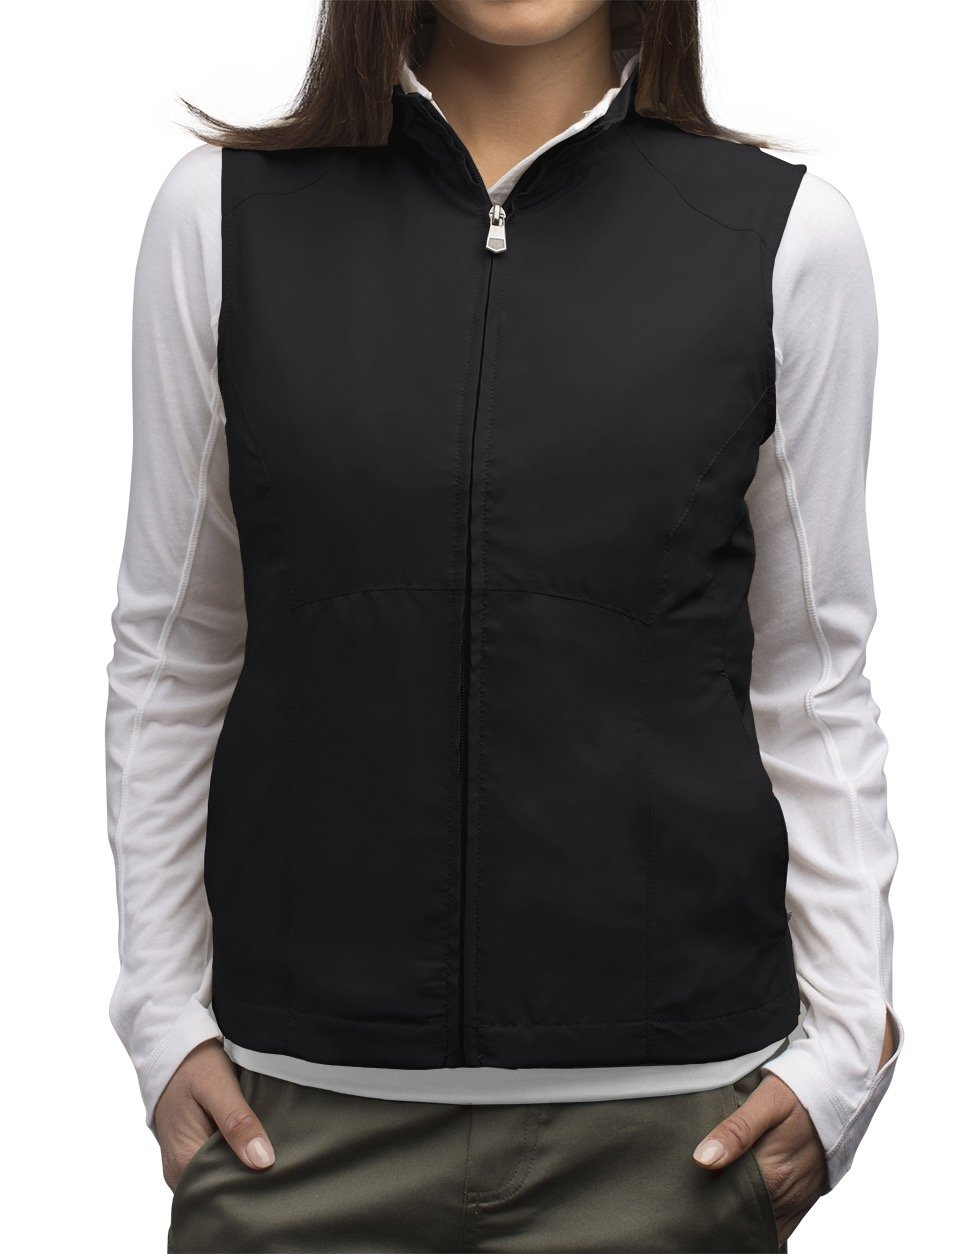 SCOTTeVEST Women's RFID Travel Vest - 18 Pockets - Travel Clothing (M3, Black)